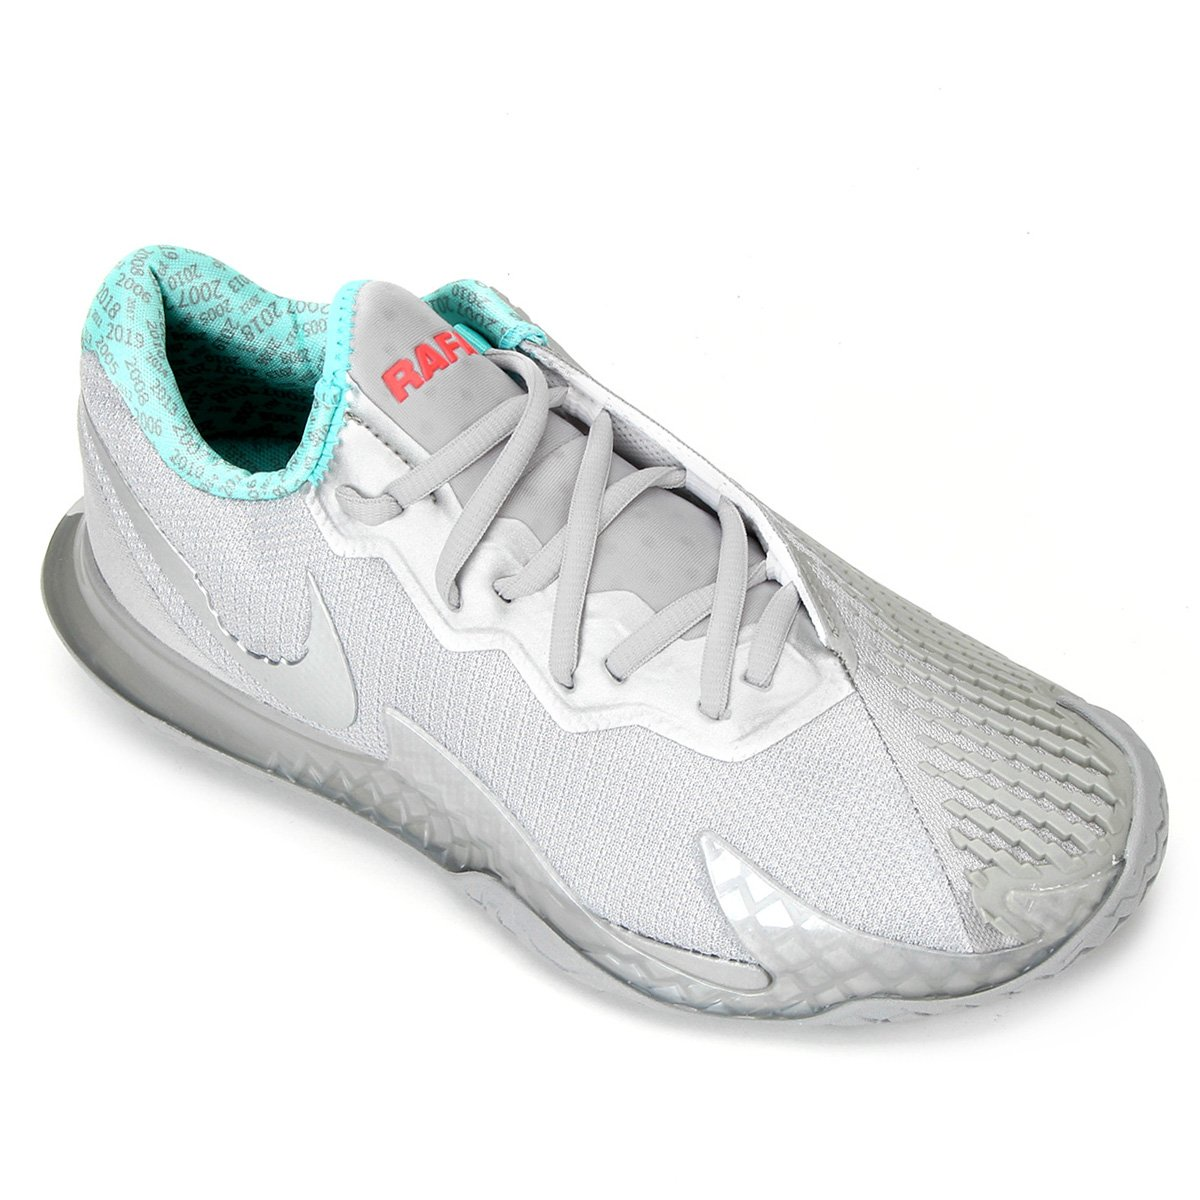 Tênis Nike AirZoom Vapor Cage 4 HC Masculino - Prata  - PROTENISTA